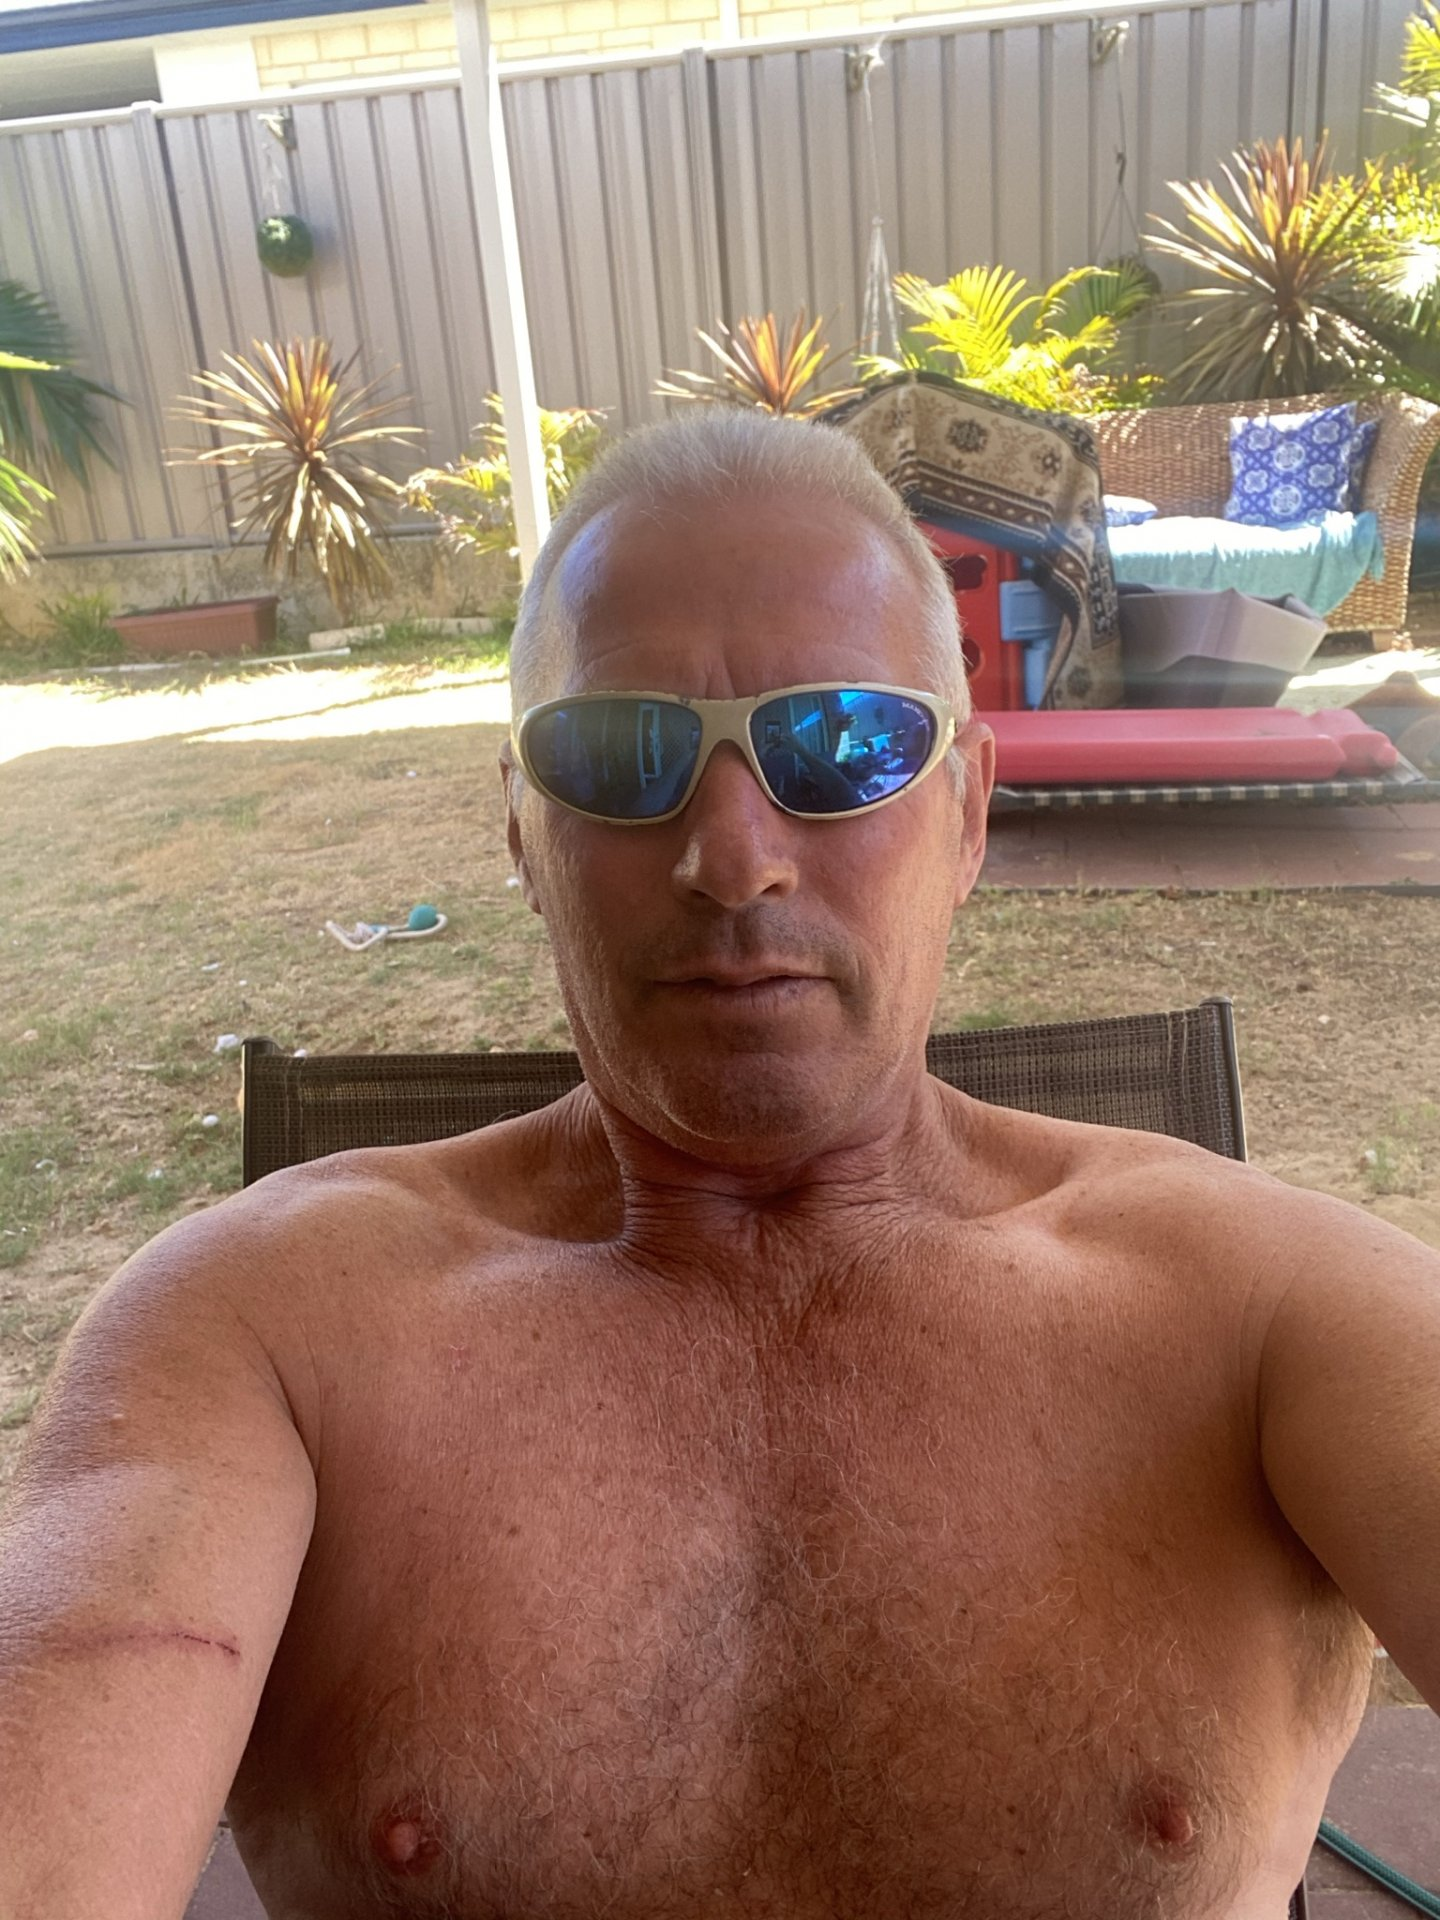 Jigsawman  from Western Australia,Australia